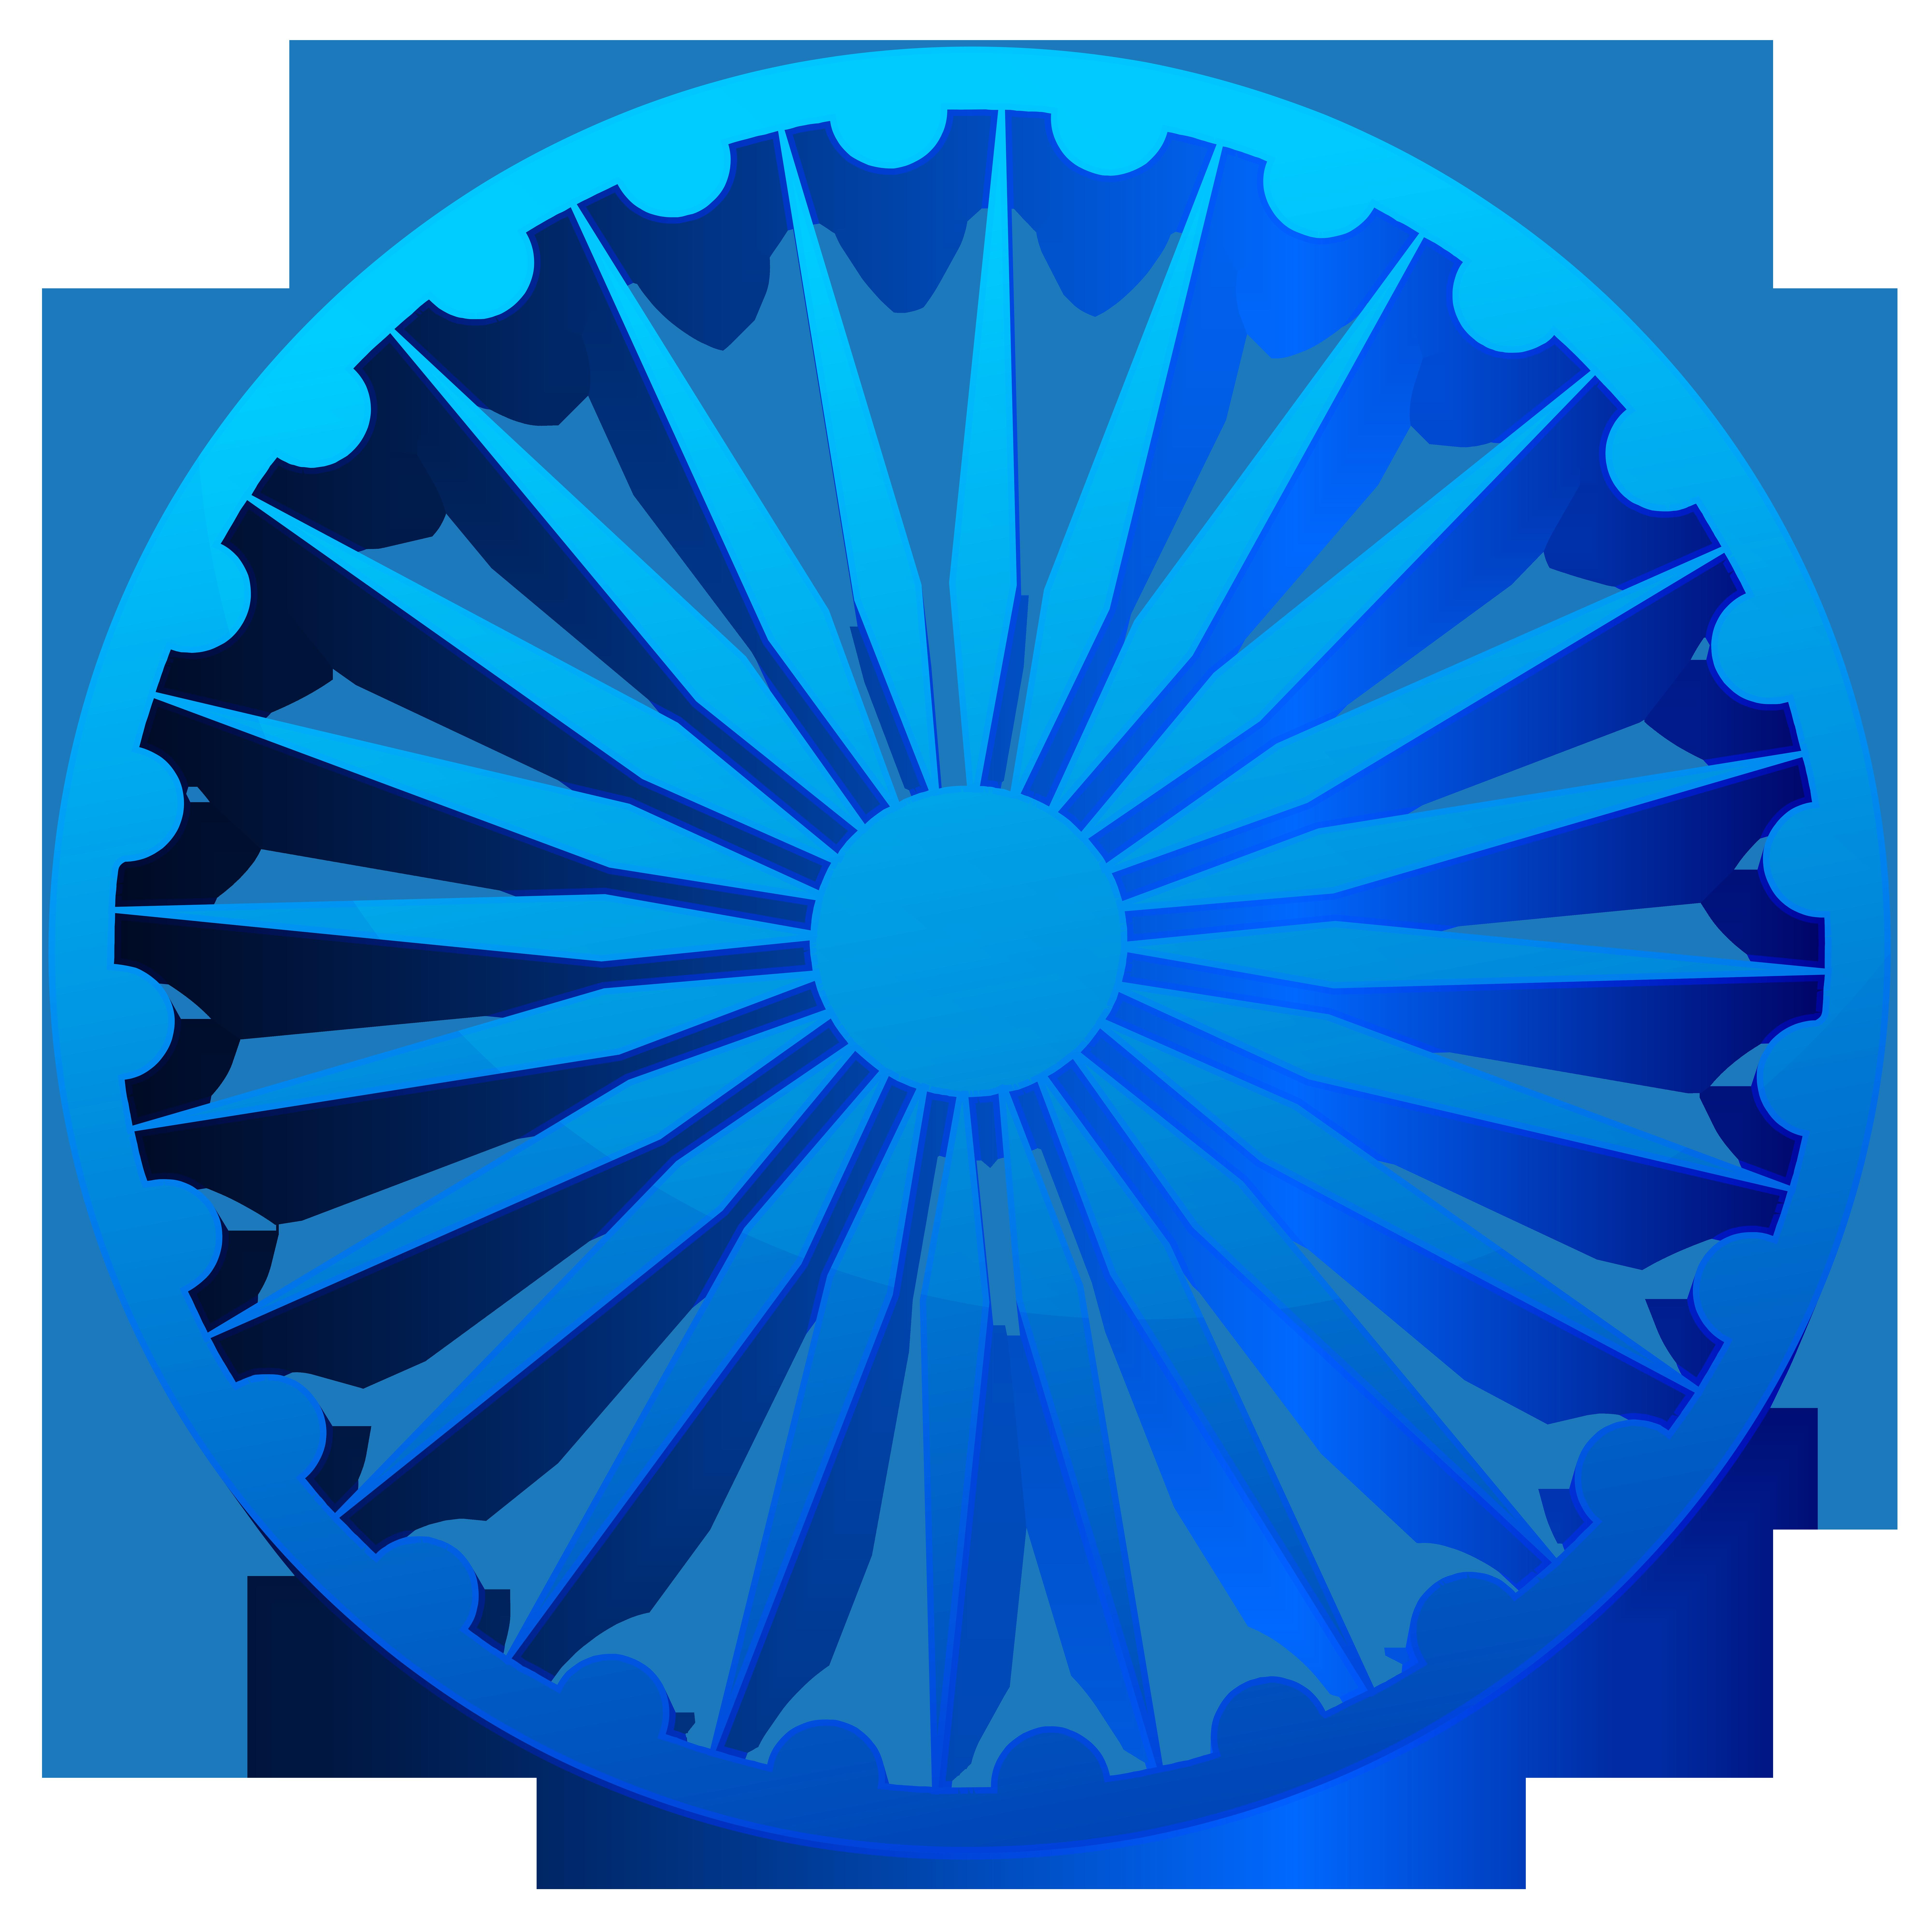 Ashoka Chakra India Transparent PNG Clip Art Image